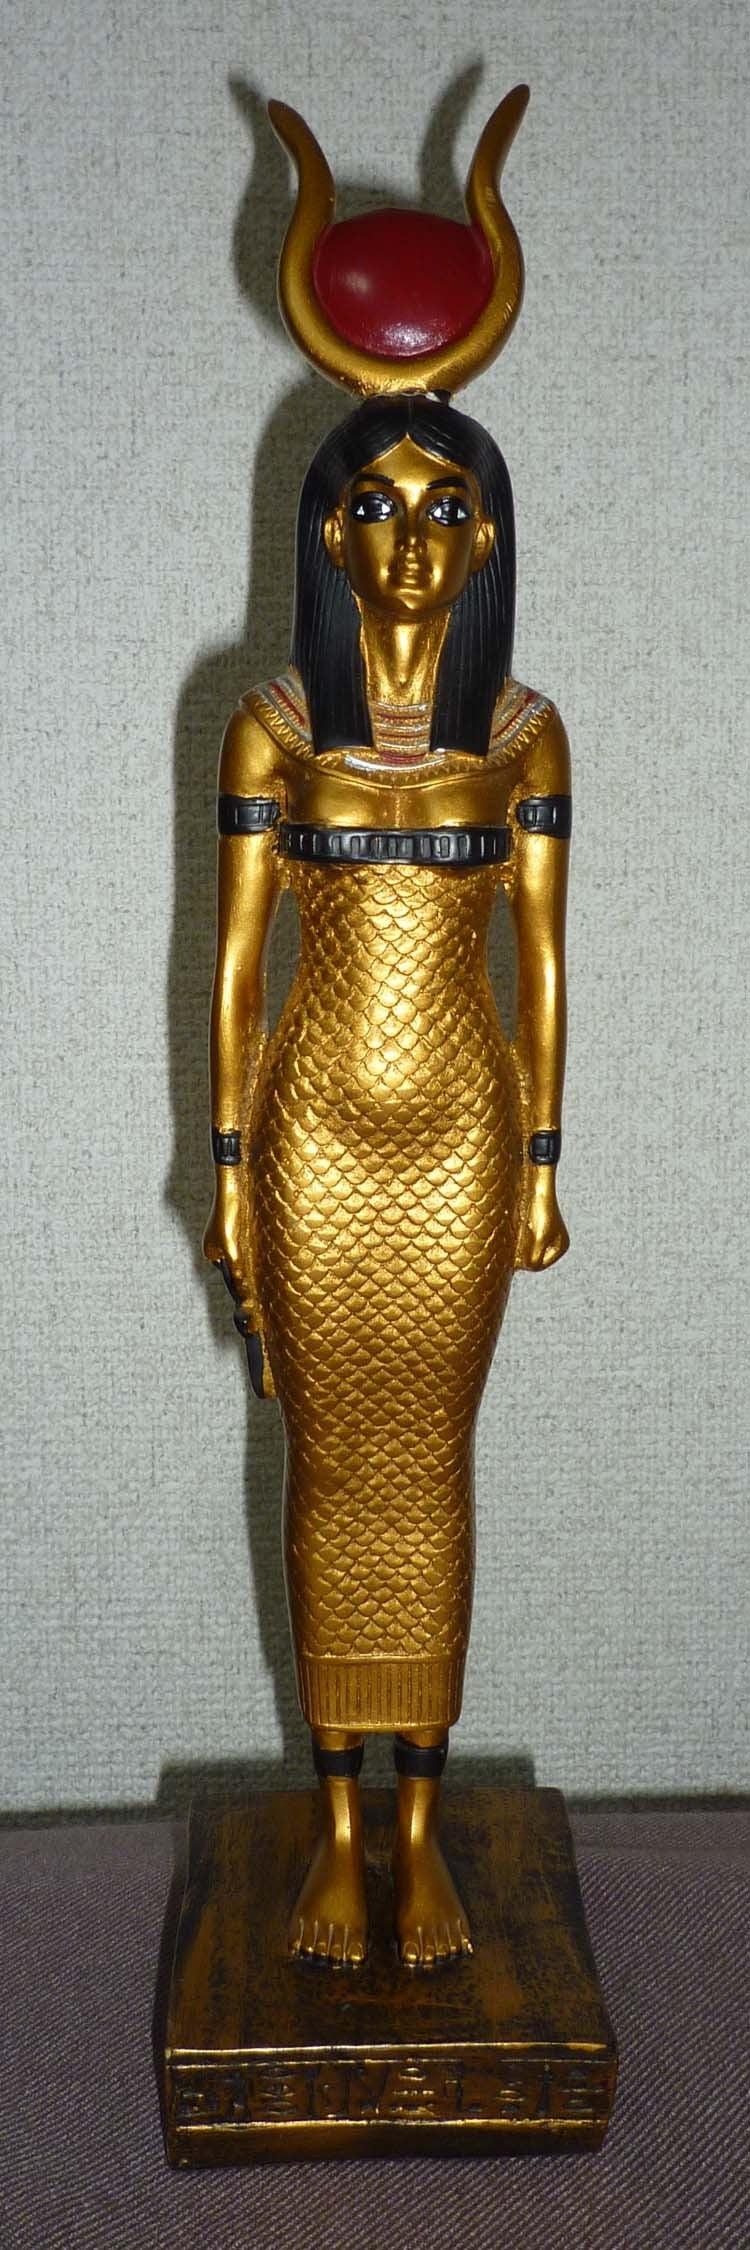 Kemet ~ エジプトいろいろブログ ~